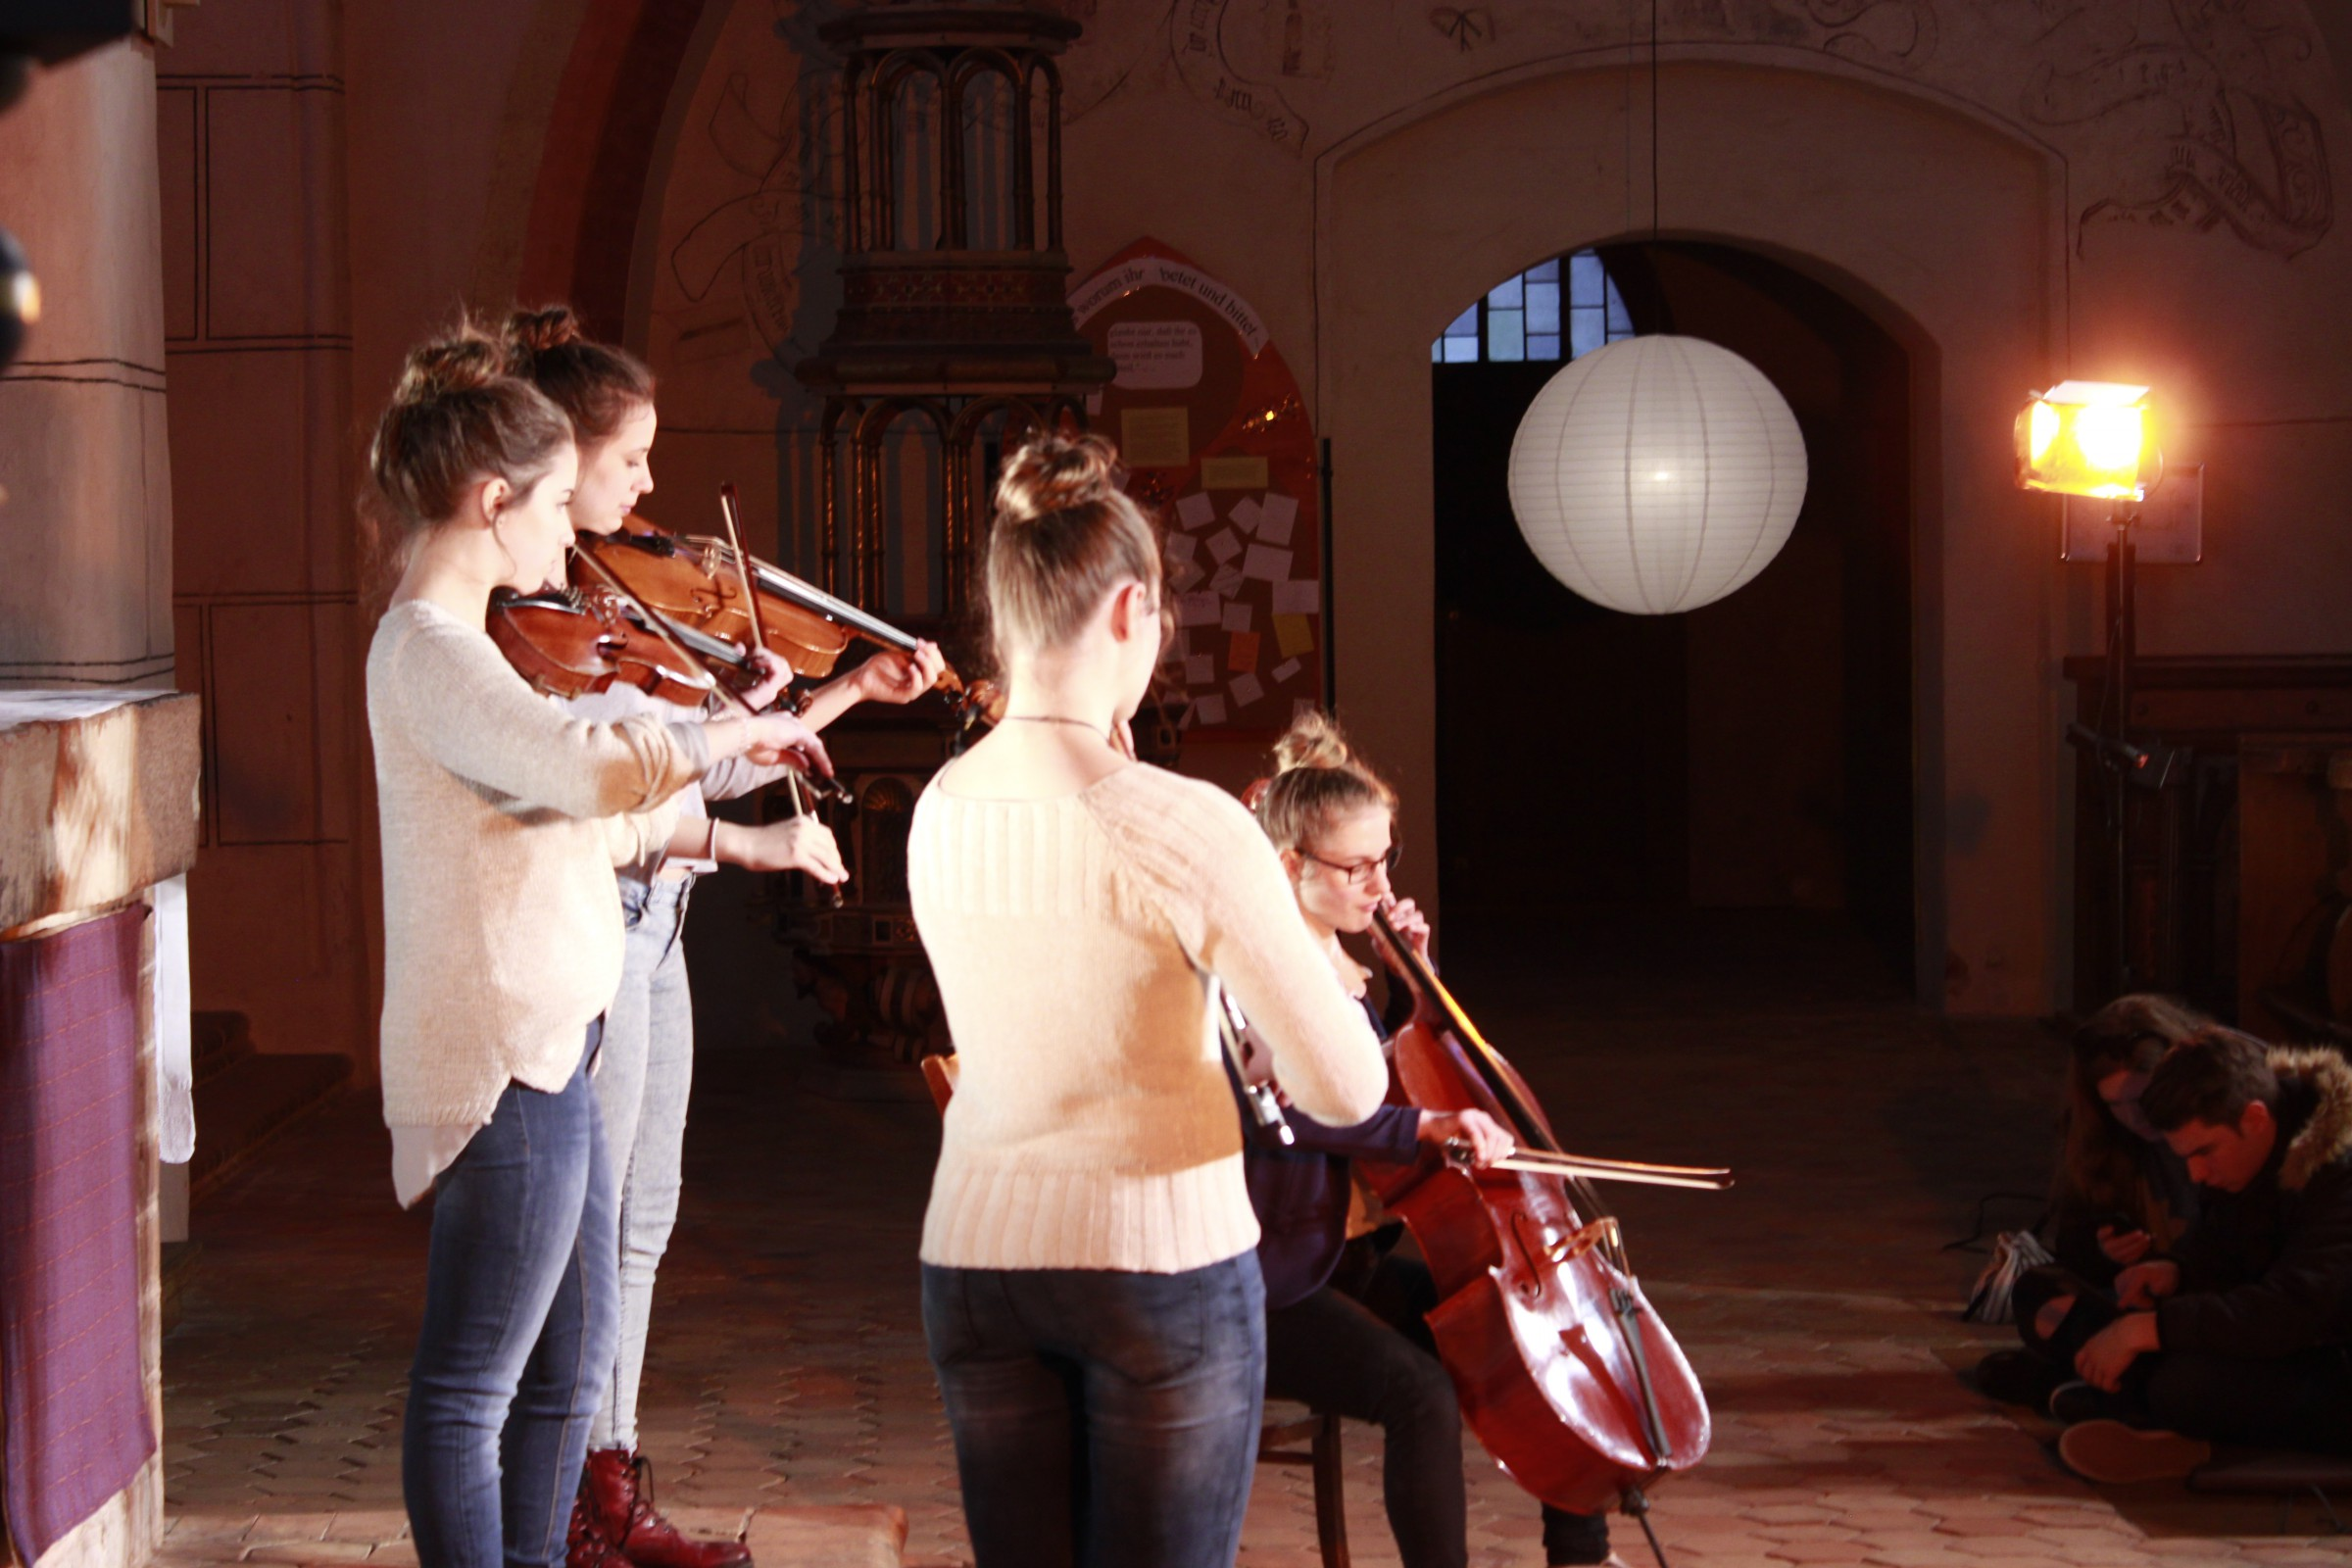 MusikvideoKircheBTS-58